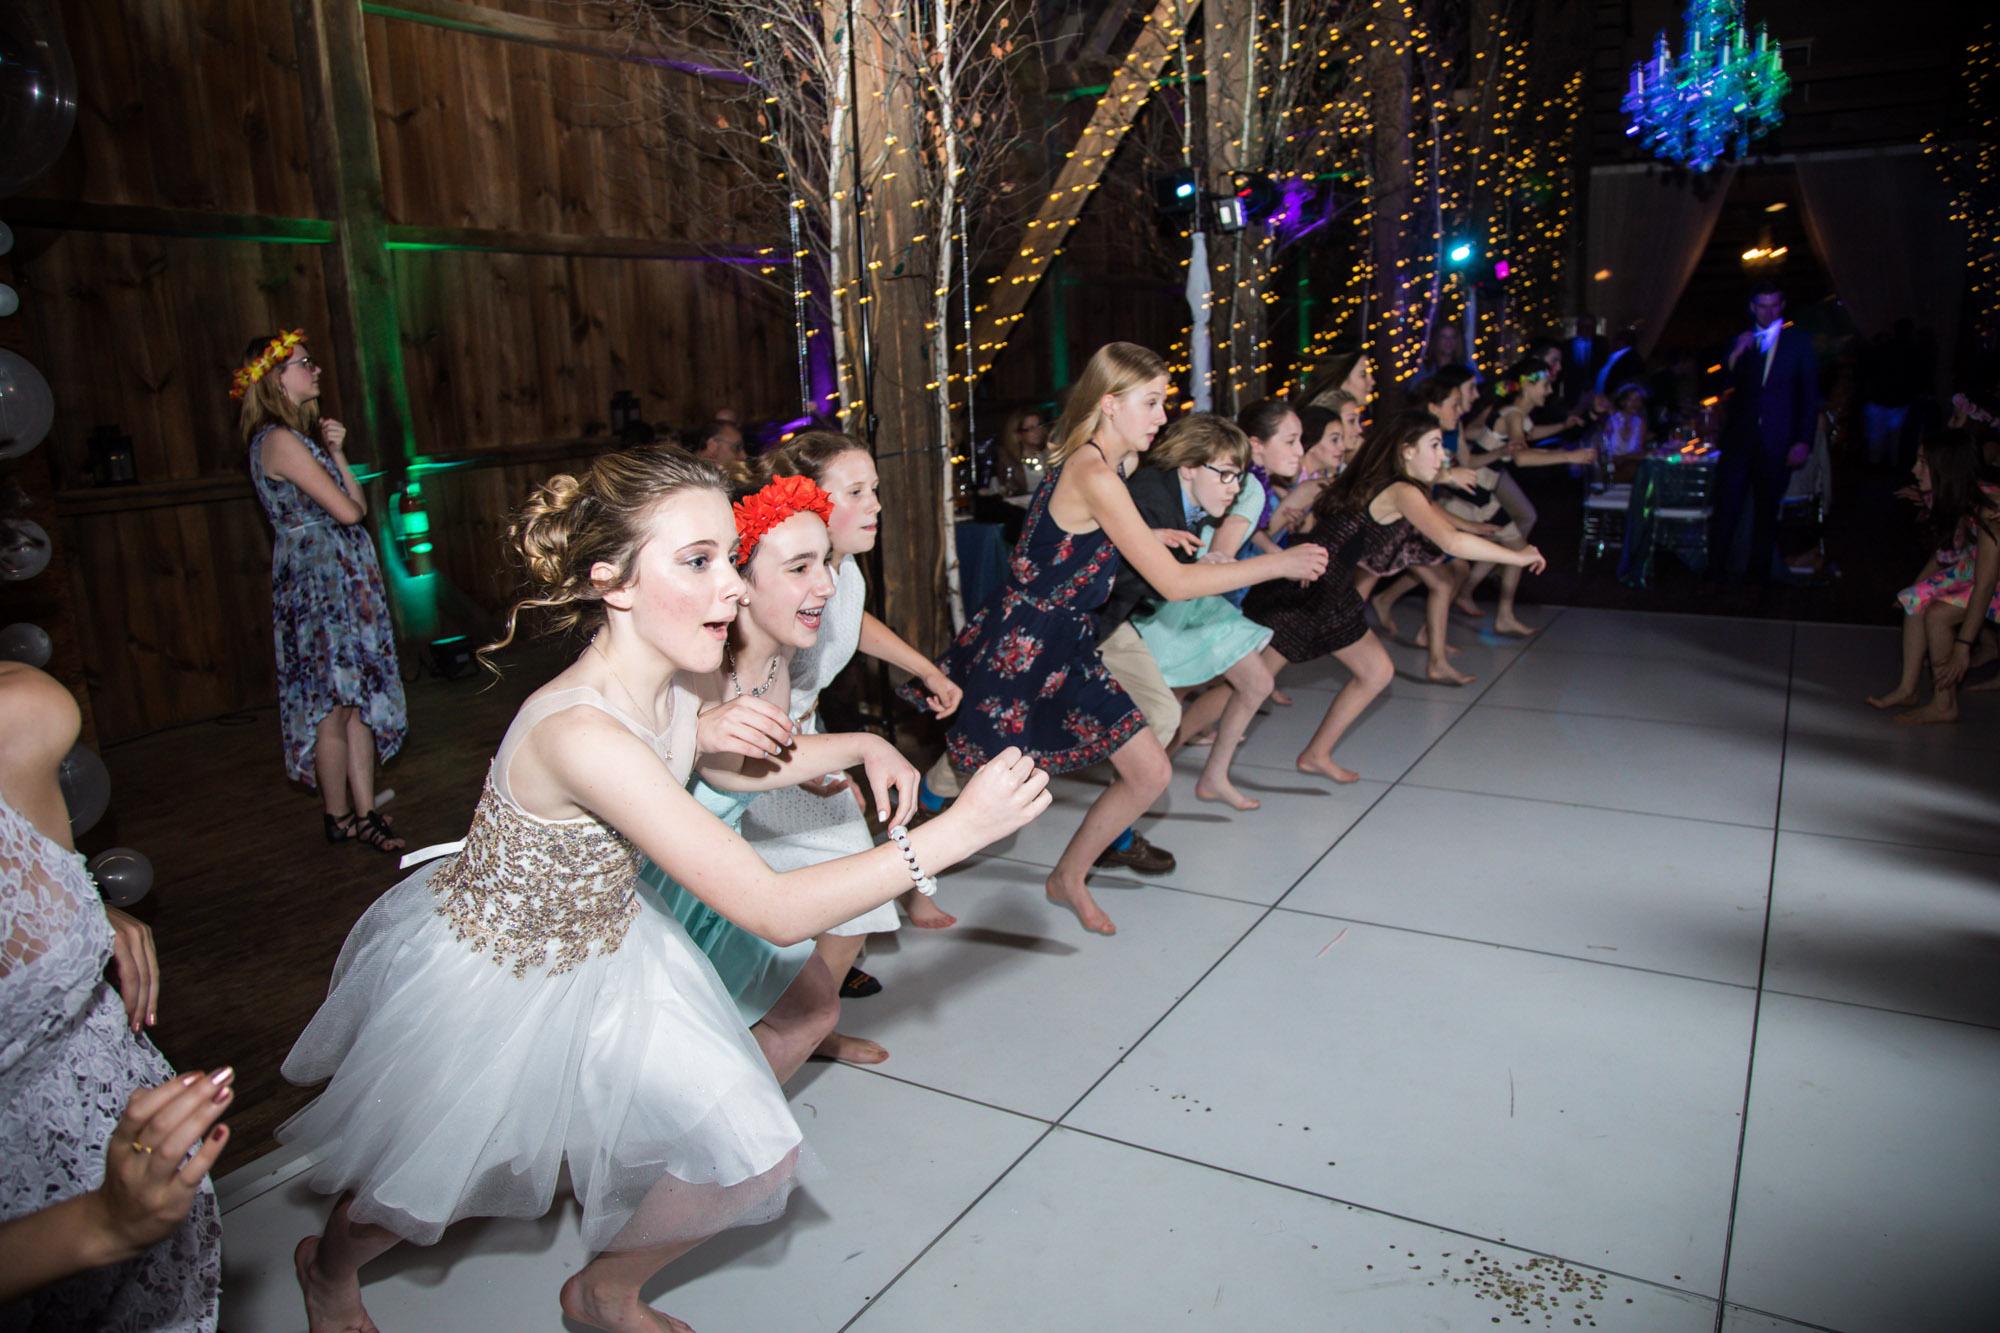 scranton_wedding_photographer_lettieri_pa (20 of 27).jpg